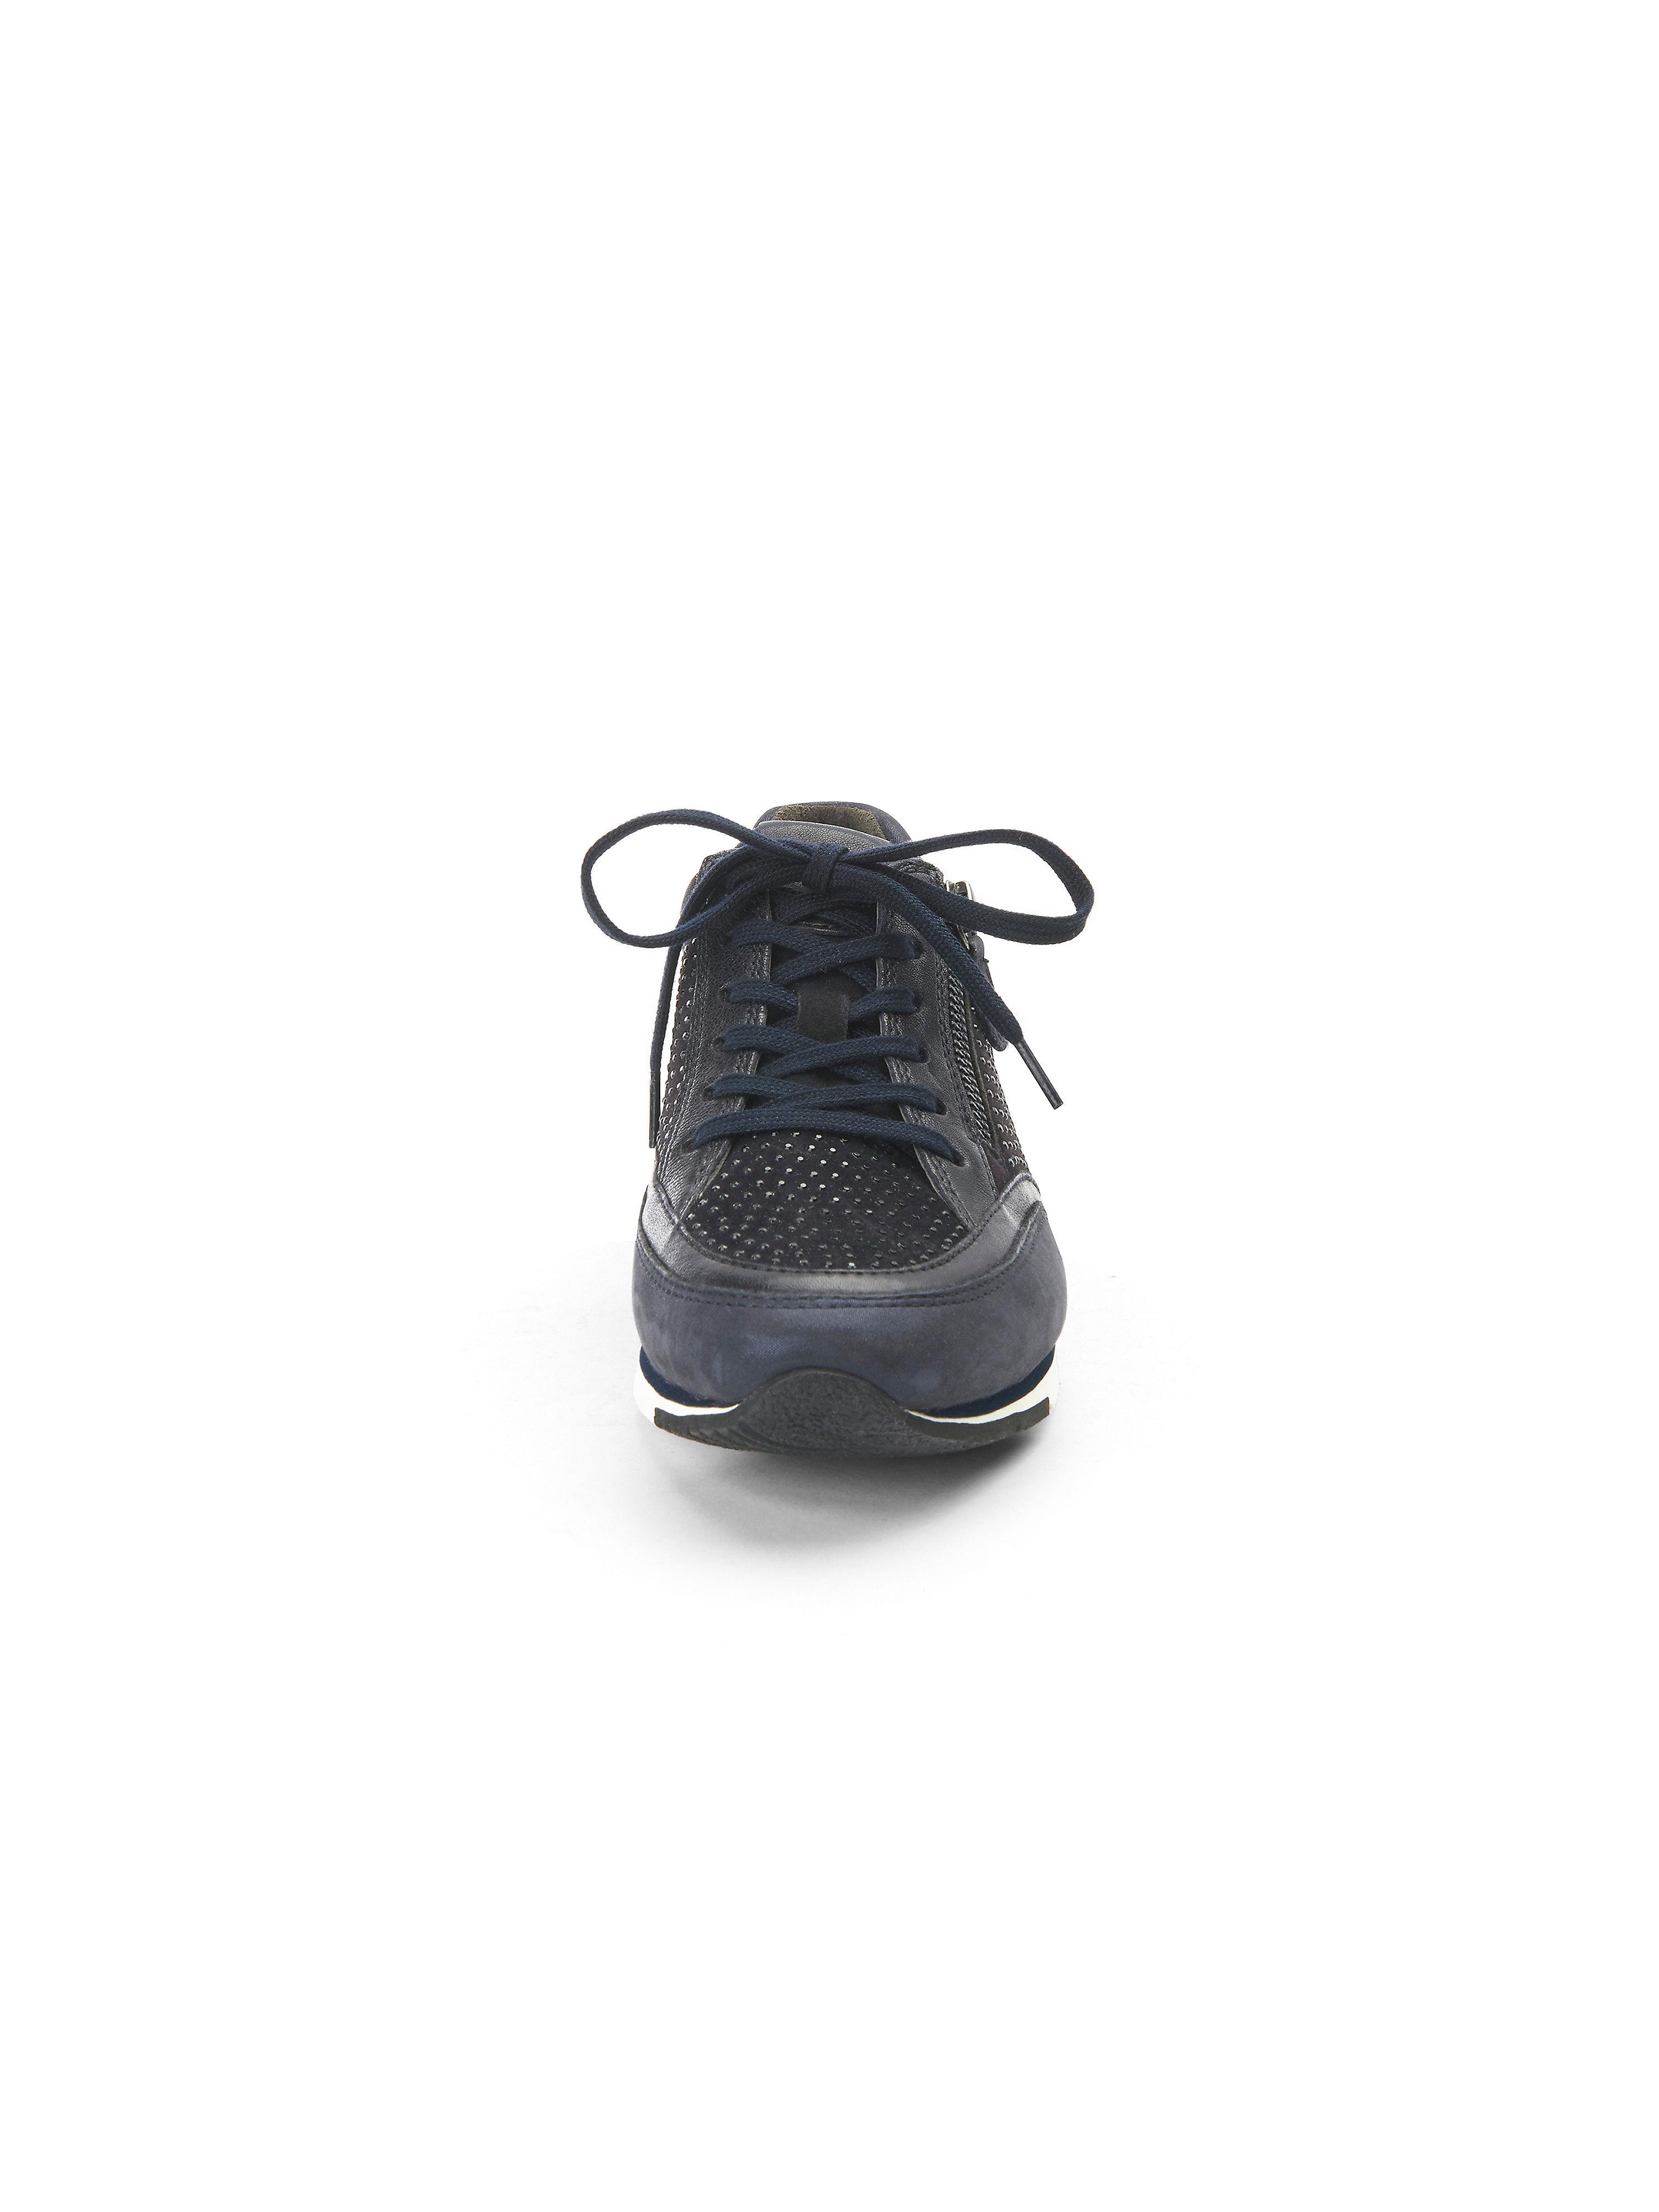 Gabor - Sneaker aus Gute 100% Leder - Marine Gute aus Qualität beliebte Schuhe cbaa29